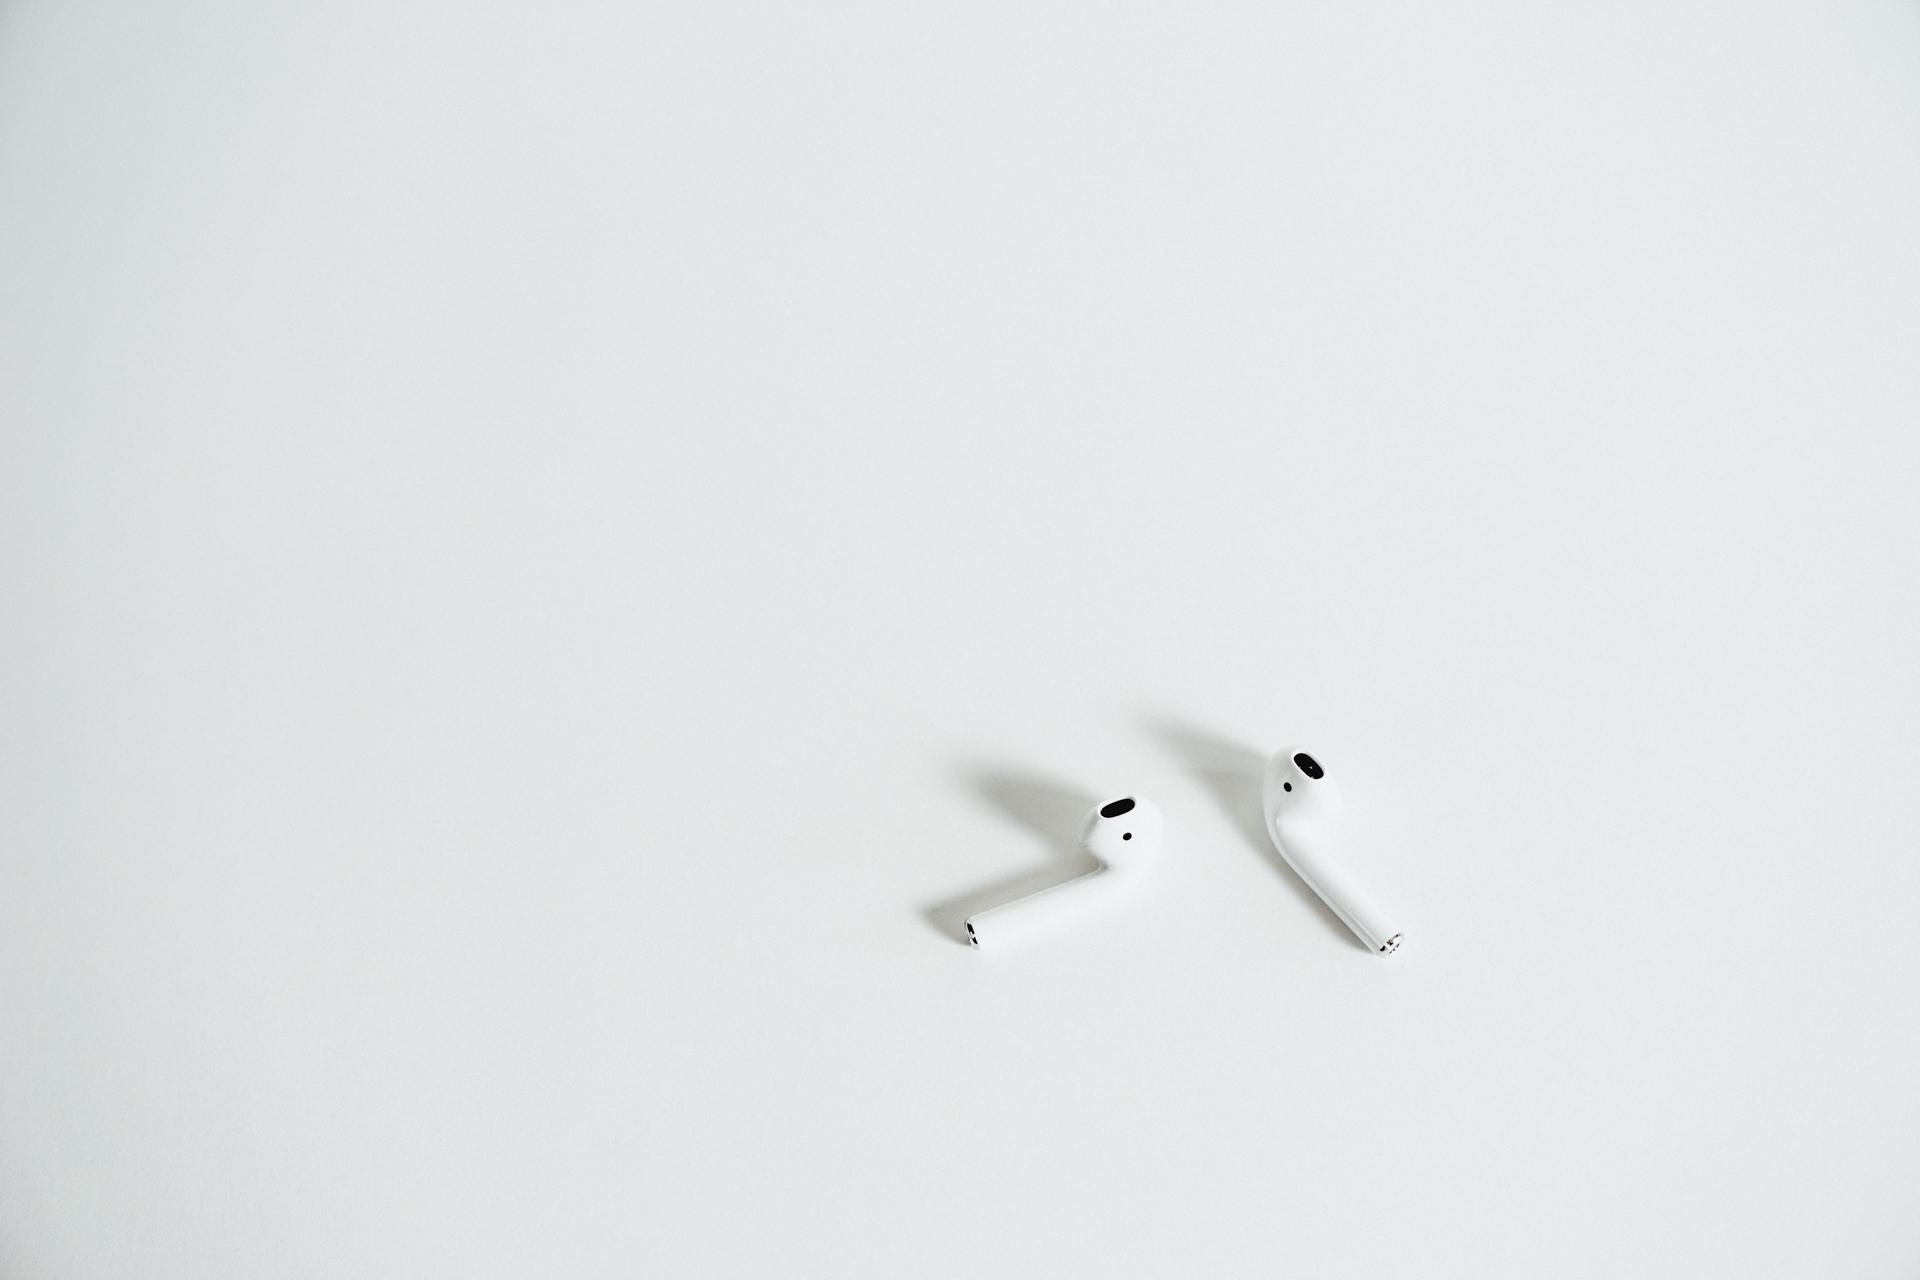 Apple-AirPods-10.jpg